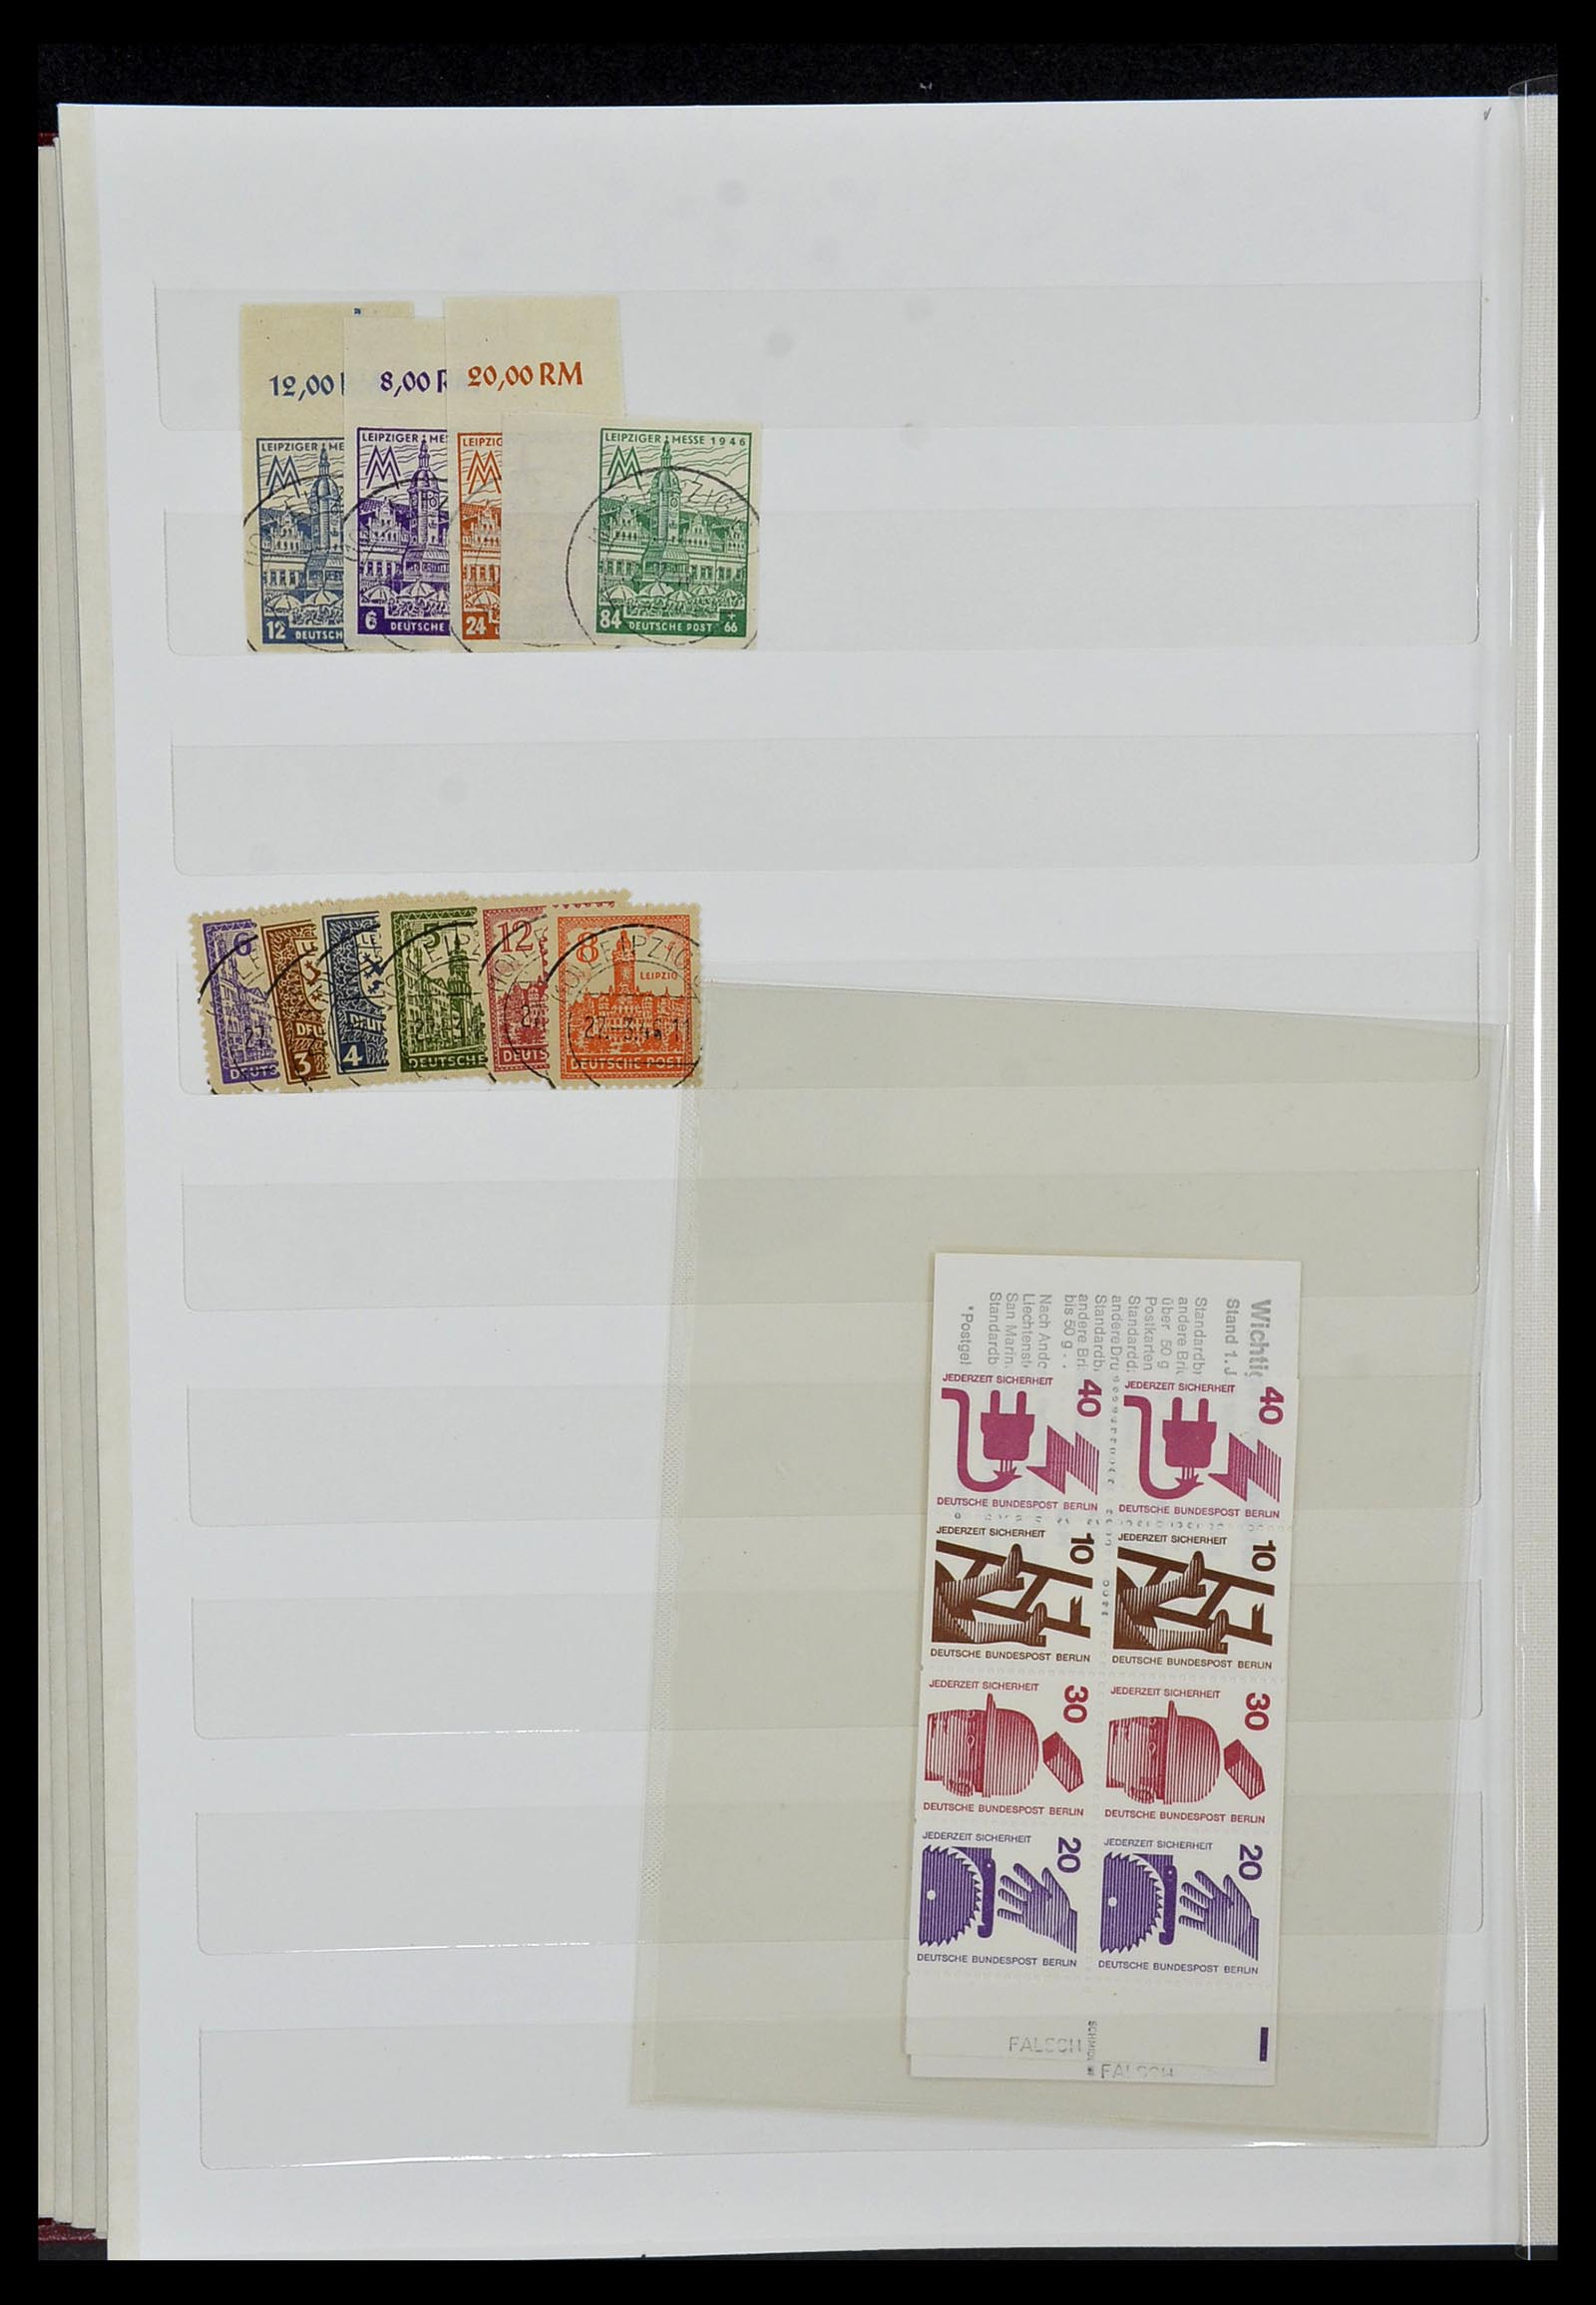 34069 013 - Postzegelverzameling 34069 Duitsland 1855-1952.